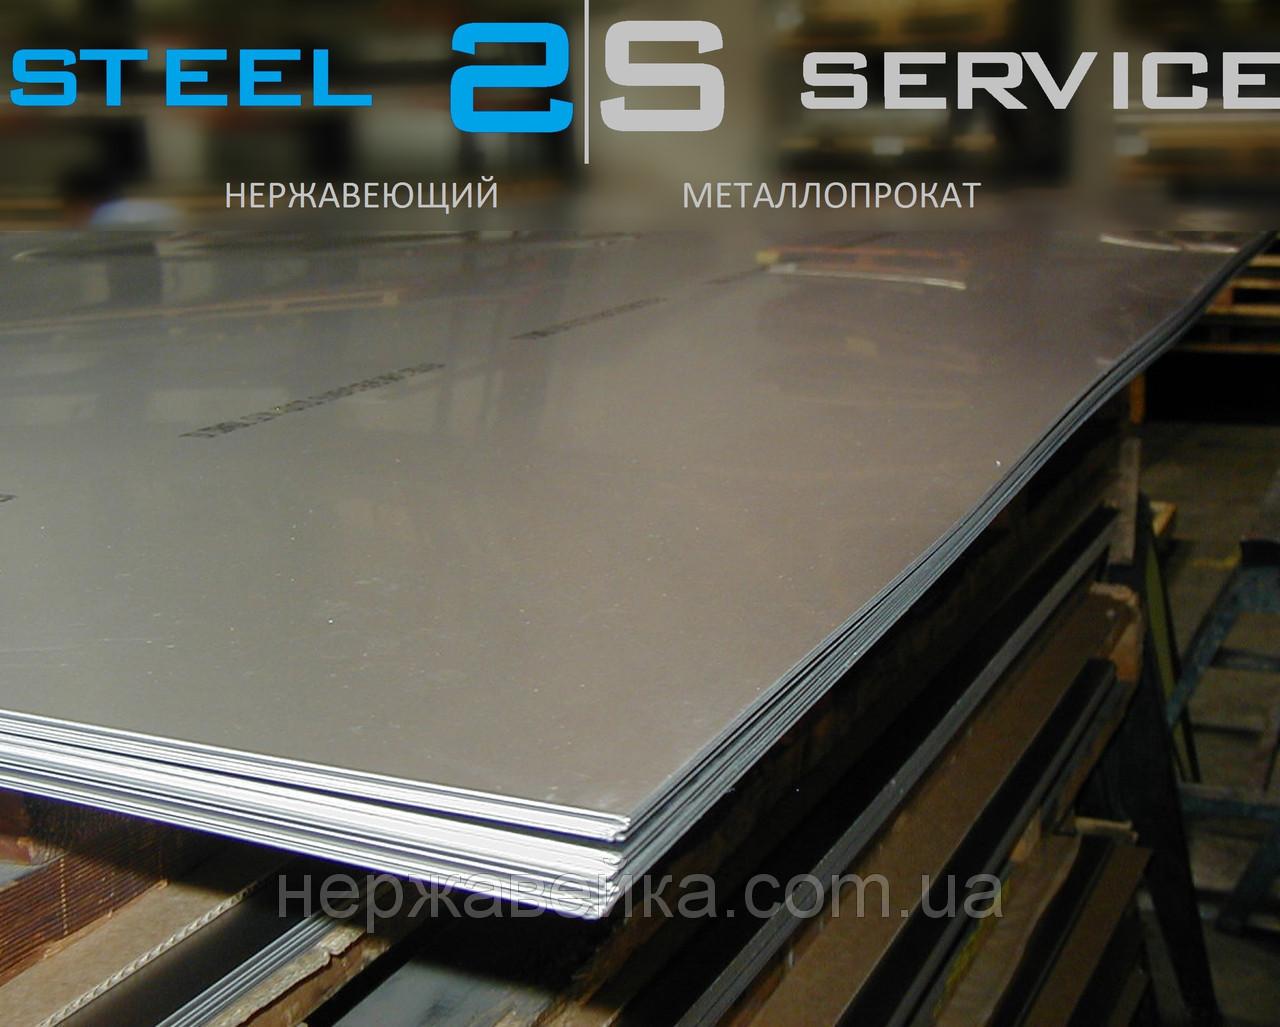 Нержавейка лист 20х1500х6000мм  AISI 316L(03Х17Н14М3) F1 - горячекатанный,  кислотостойкий